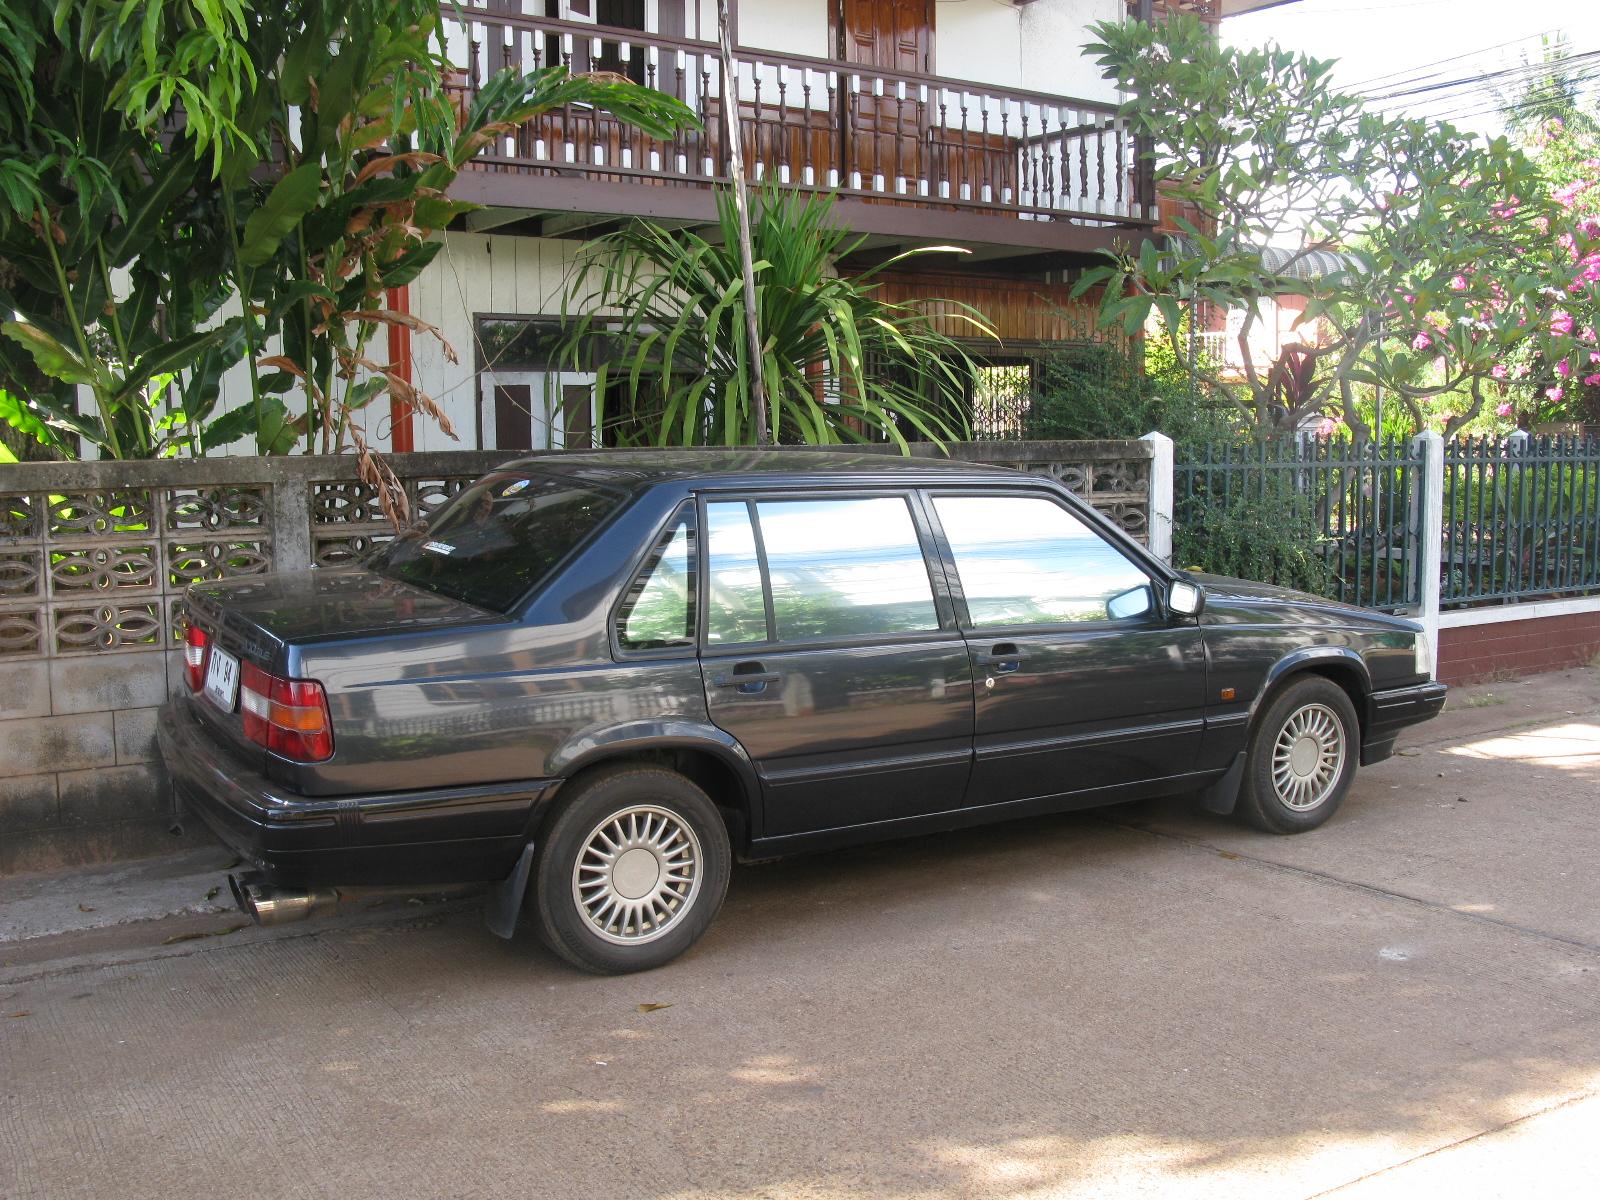 File:Volvo 940 (15712502790) jpg - Wikimedia Commons